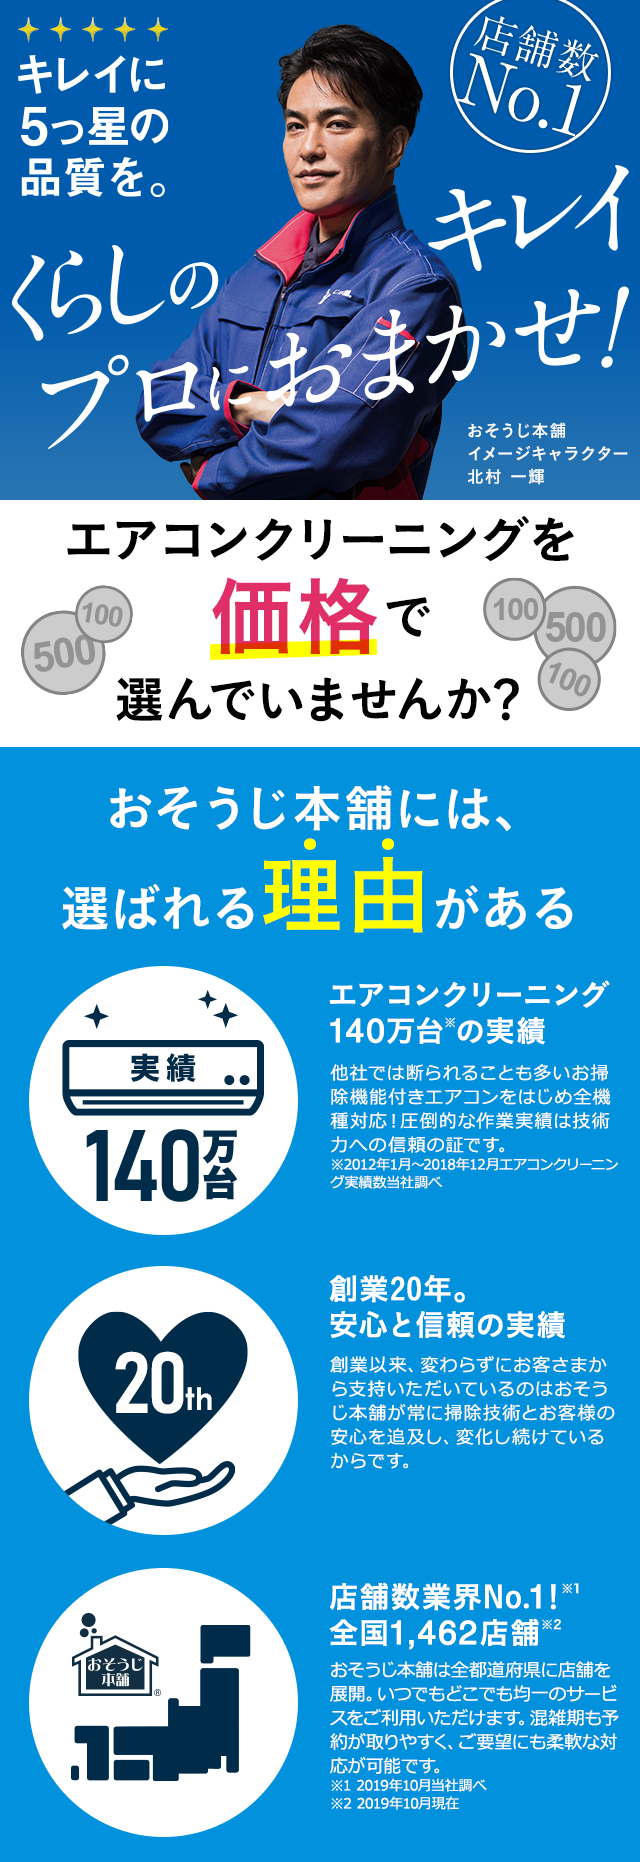 sp_2007aircon_01